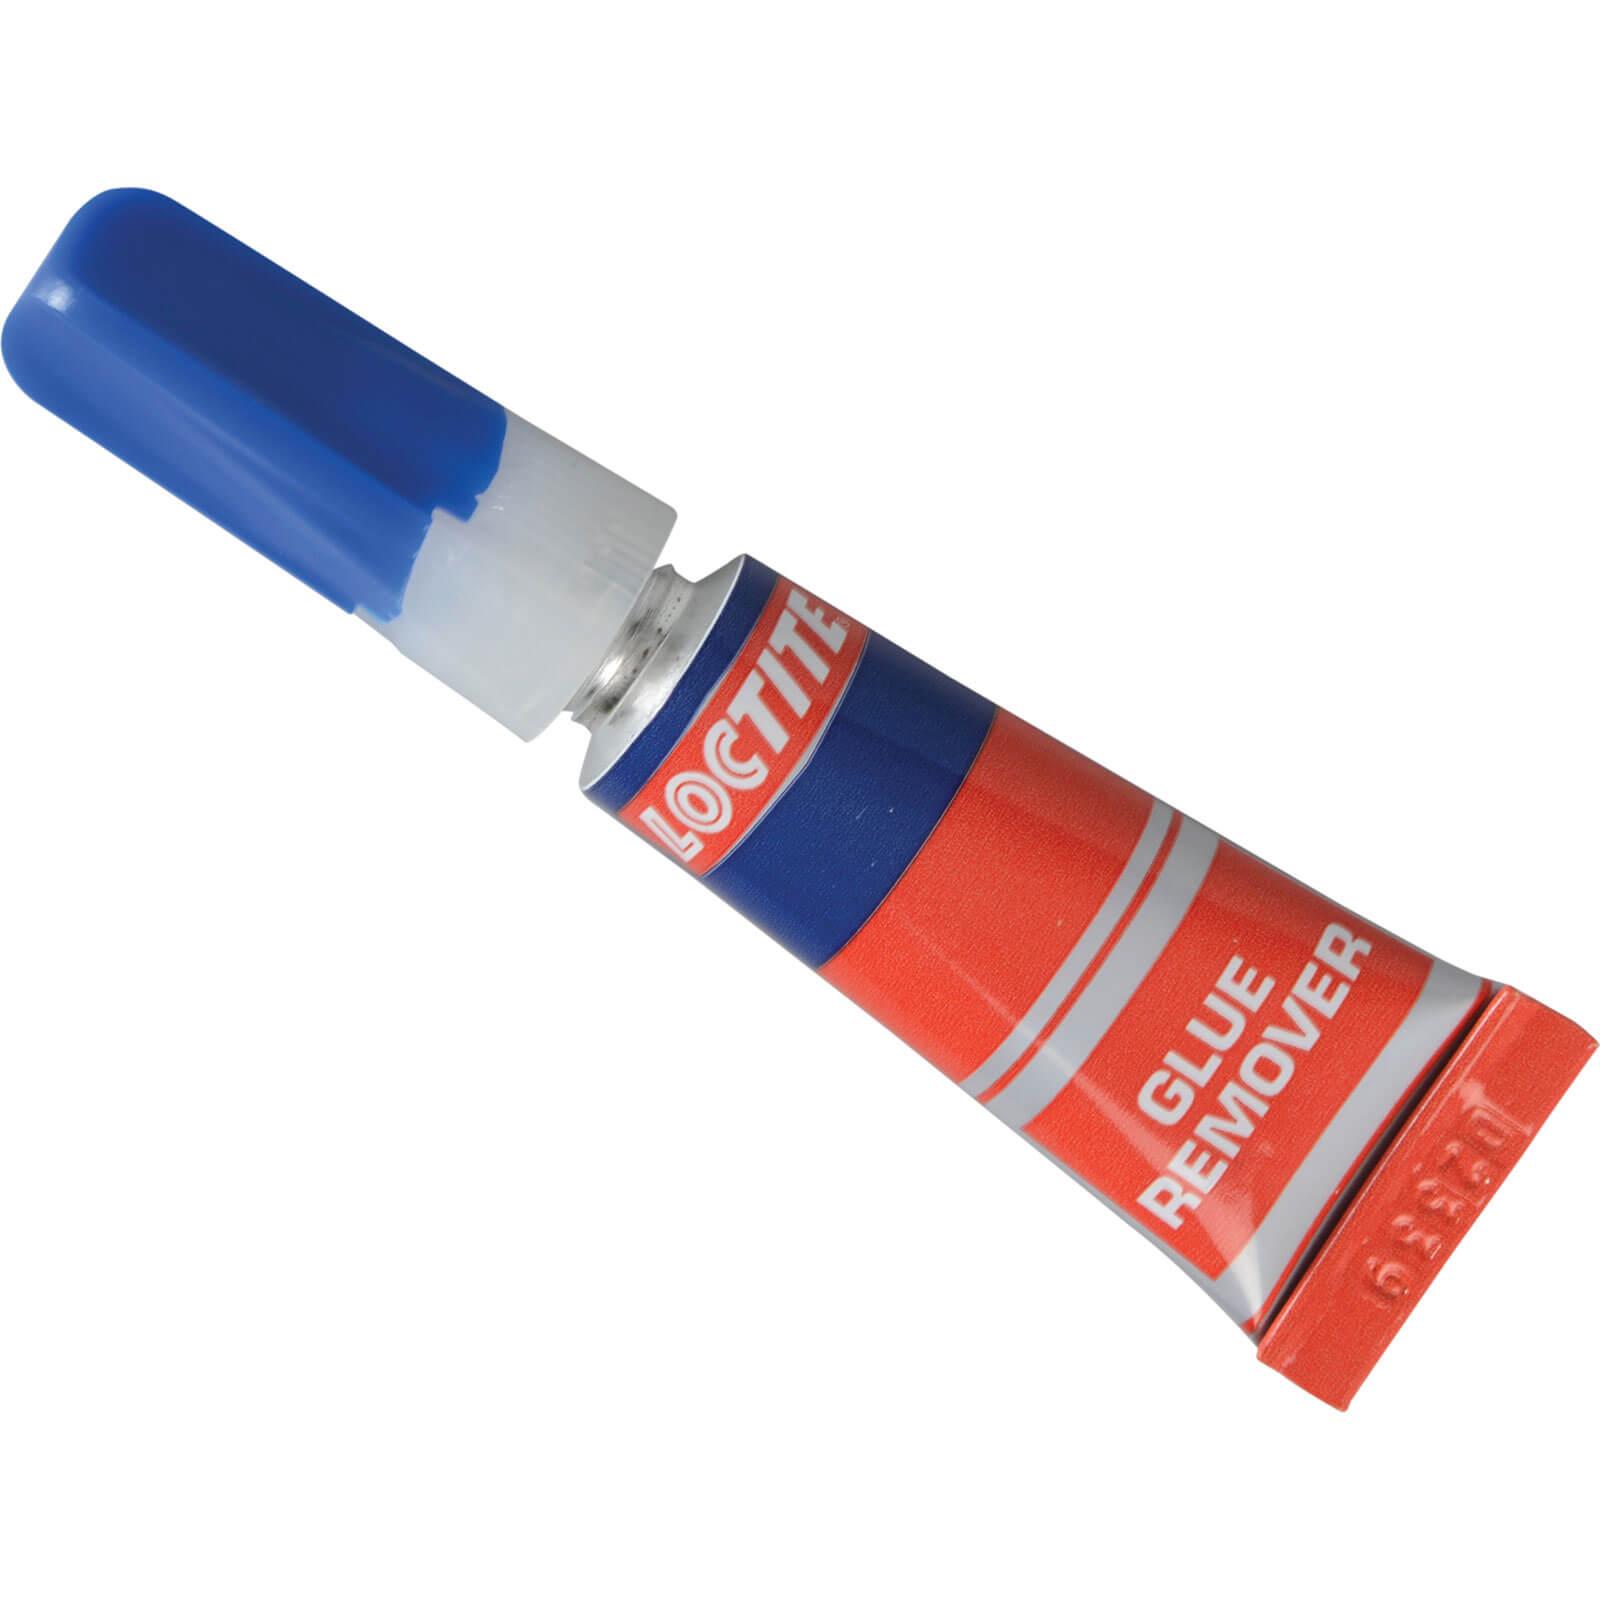 Loctite Glue Remover 5G Tube Gel 8000 0655